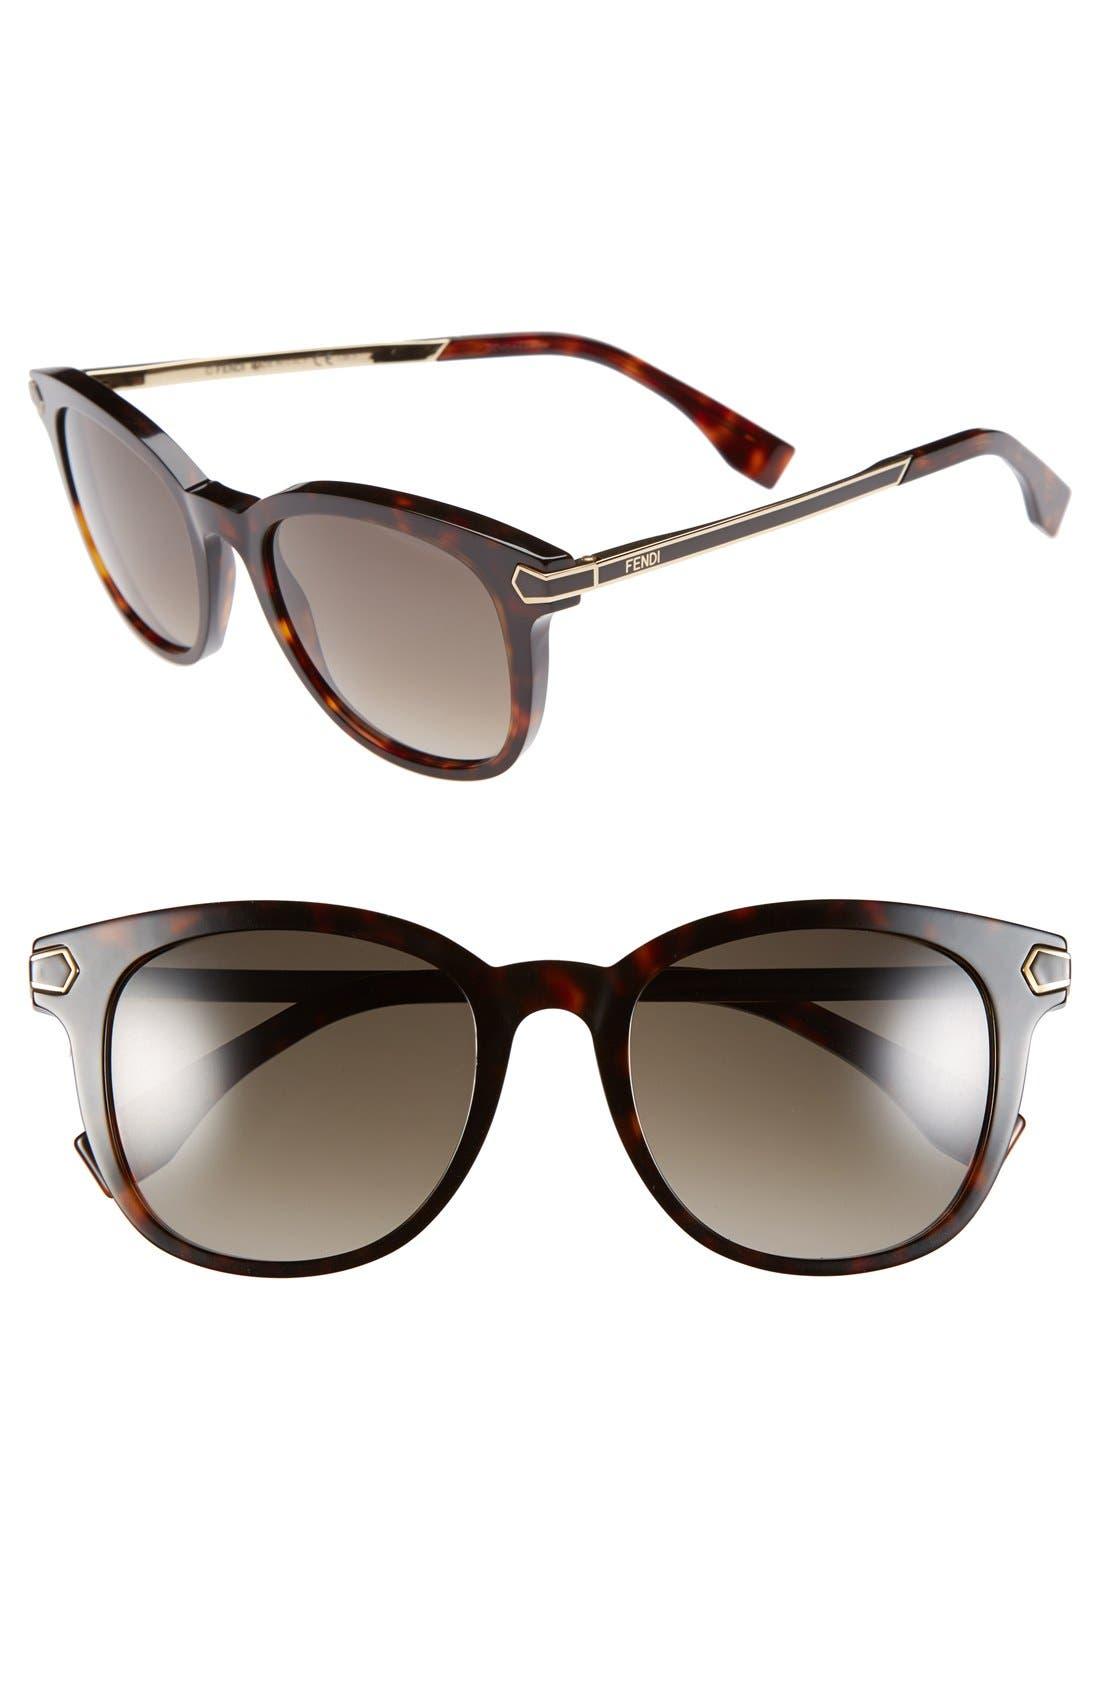 Main Image - Fendi 51mm Retro Sunglasses